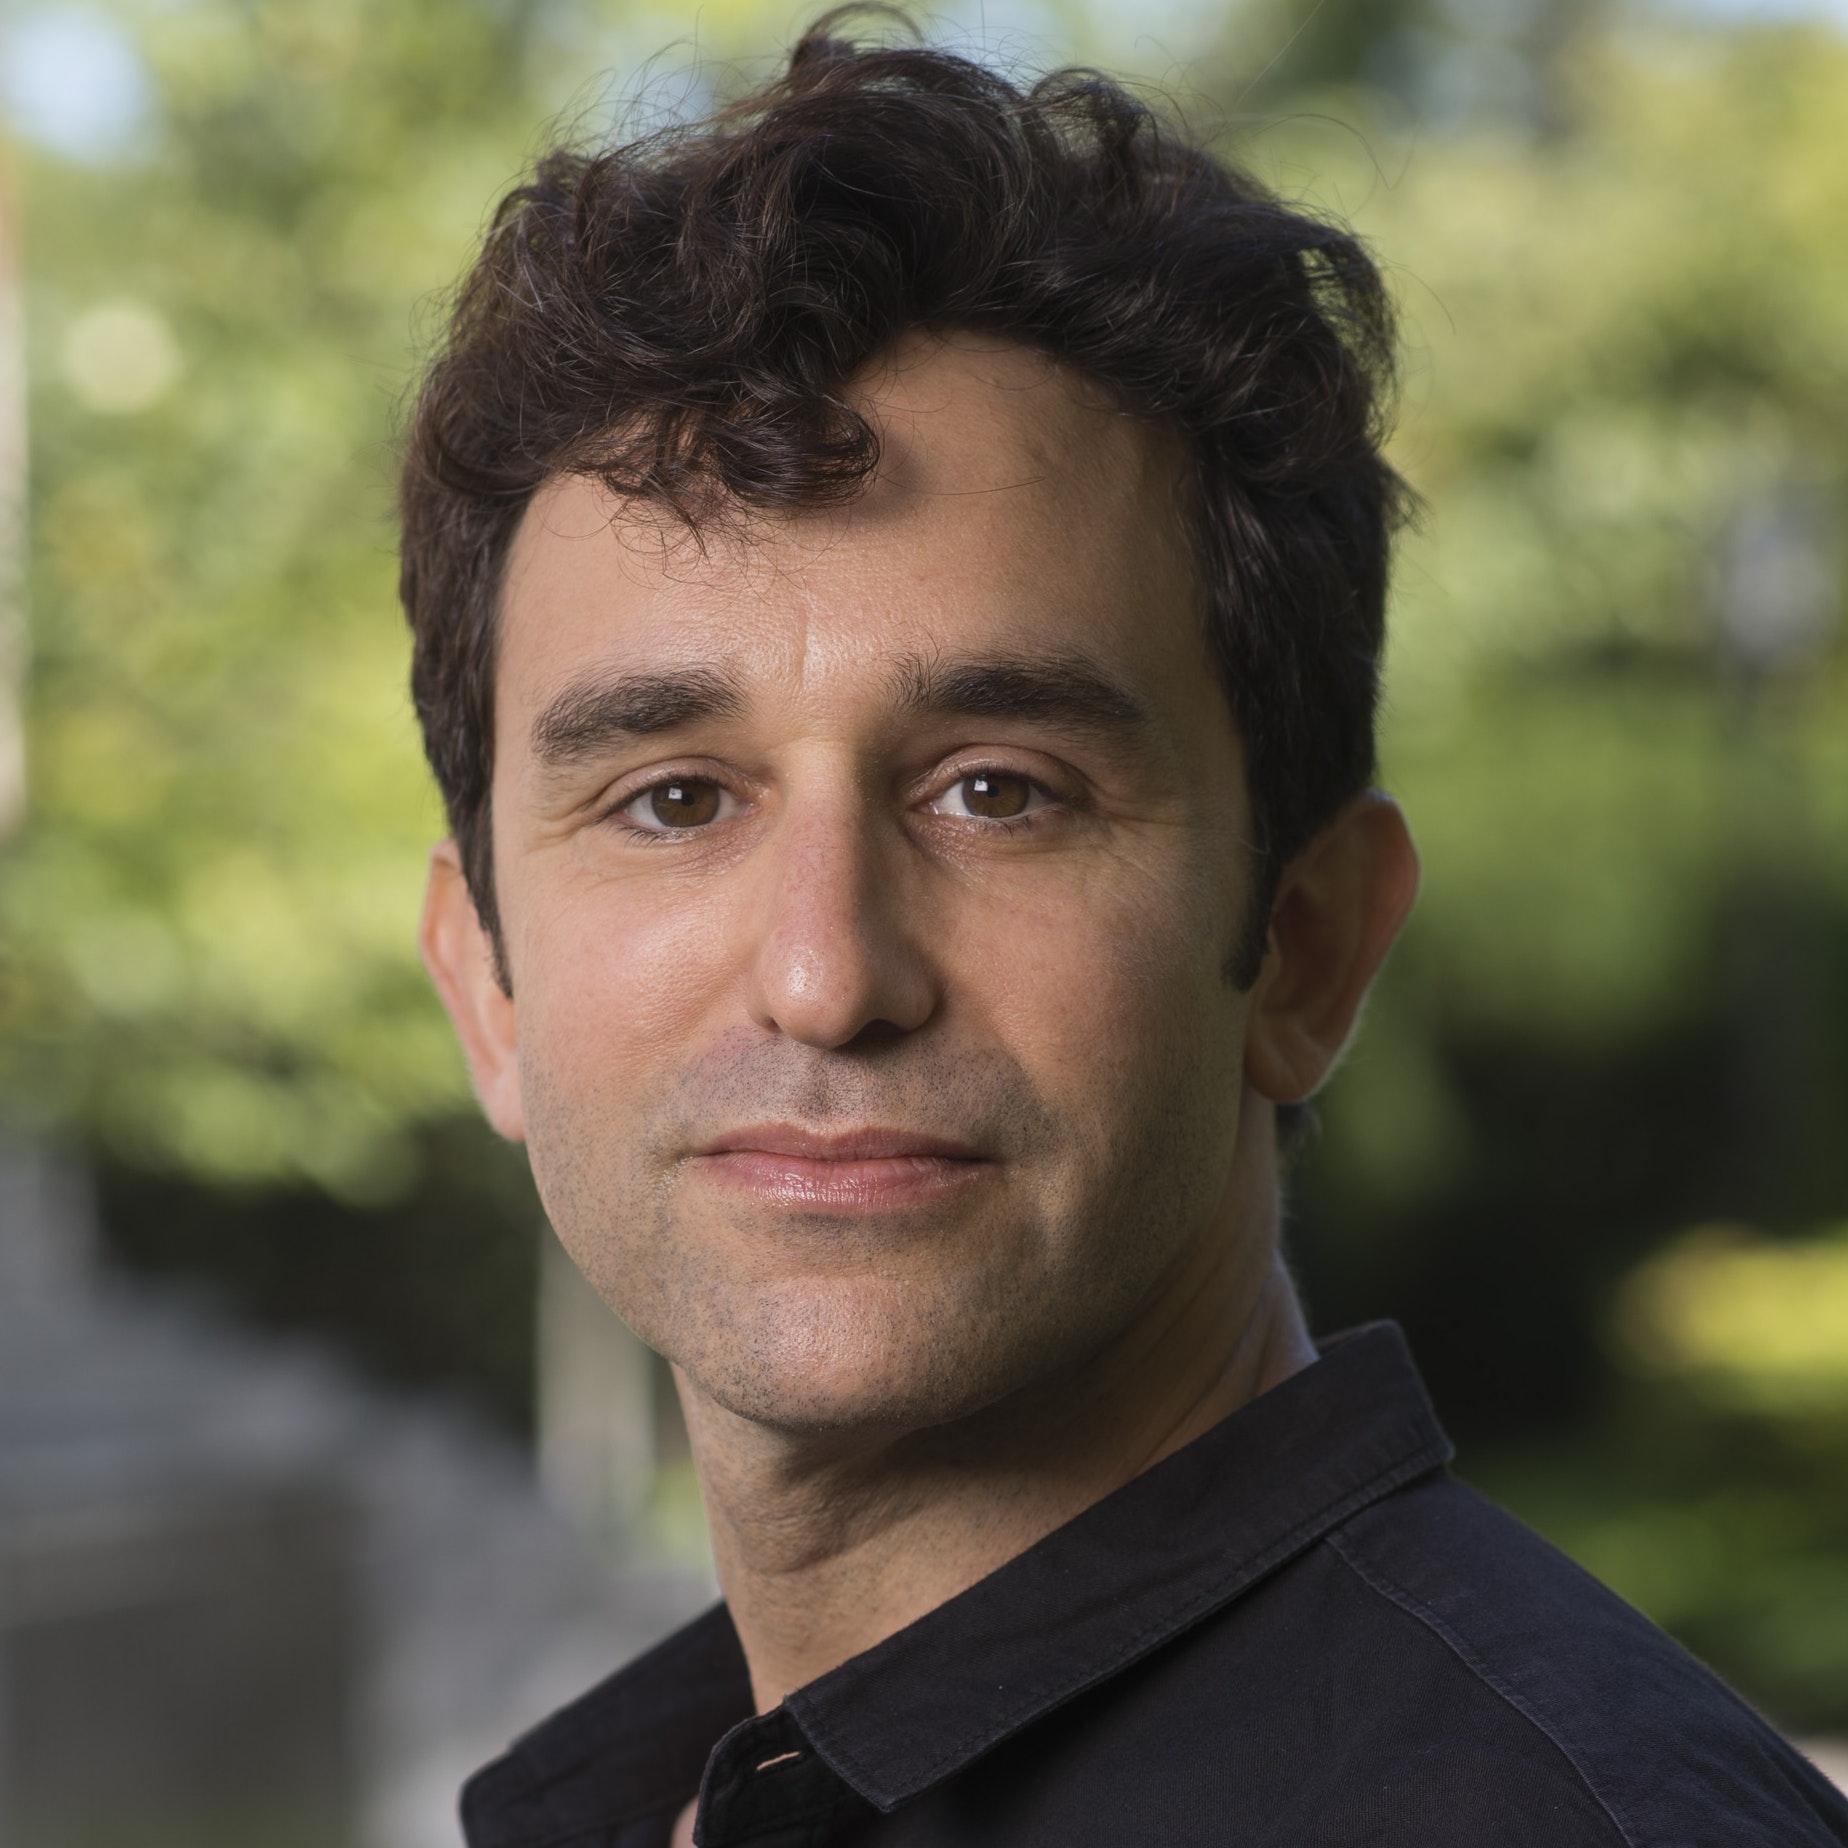 Headshot of David Gruber